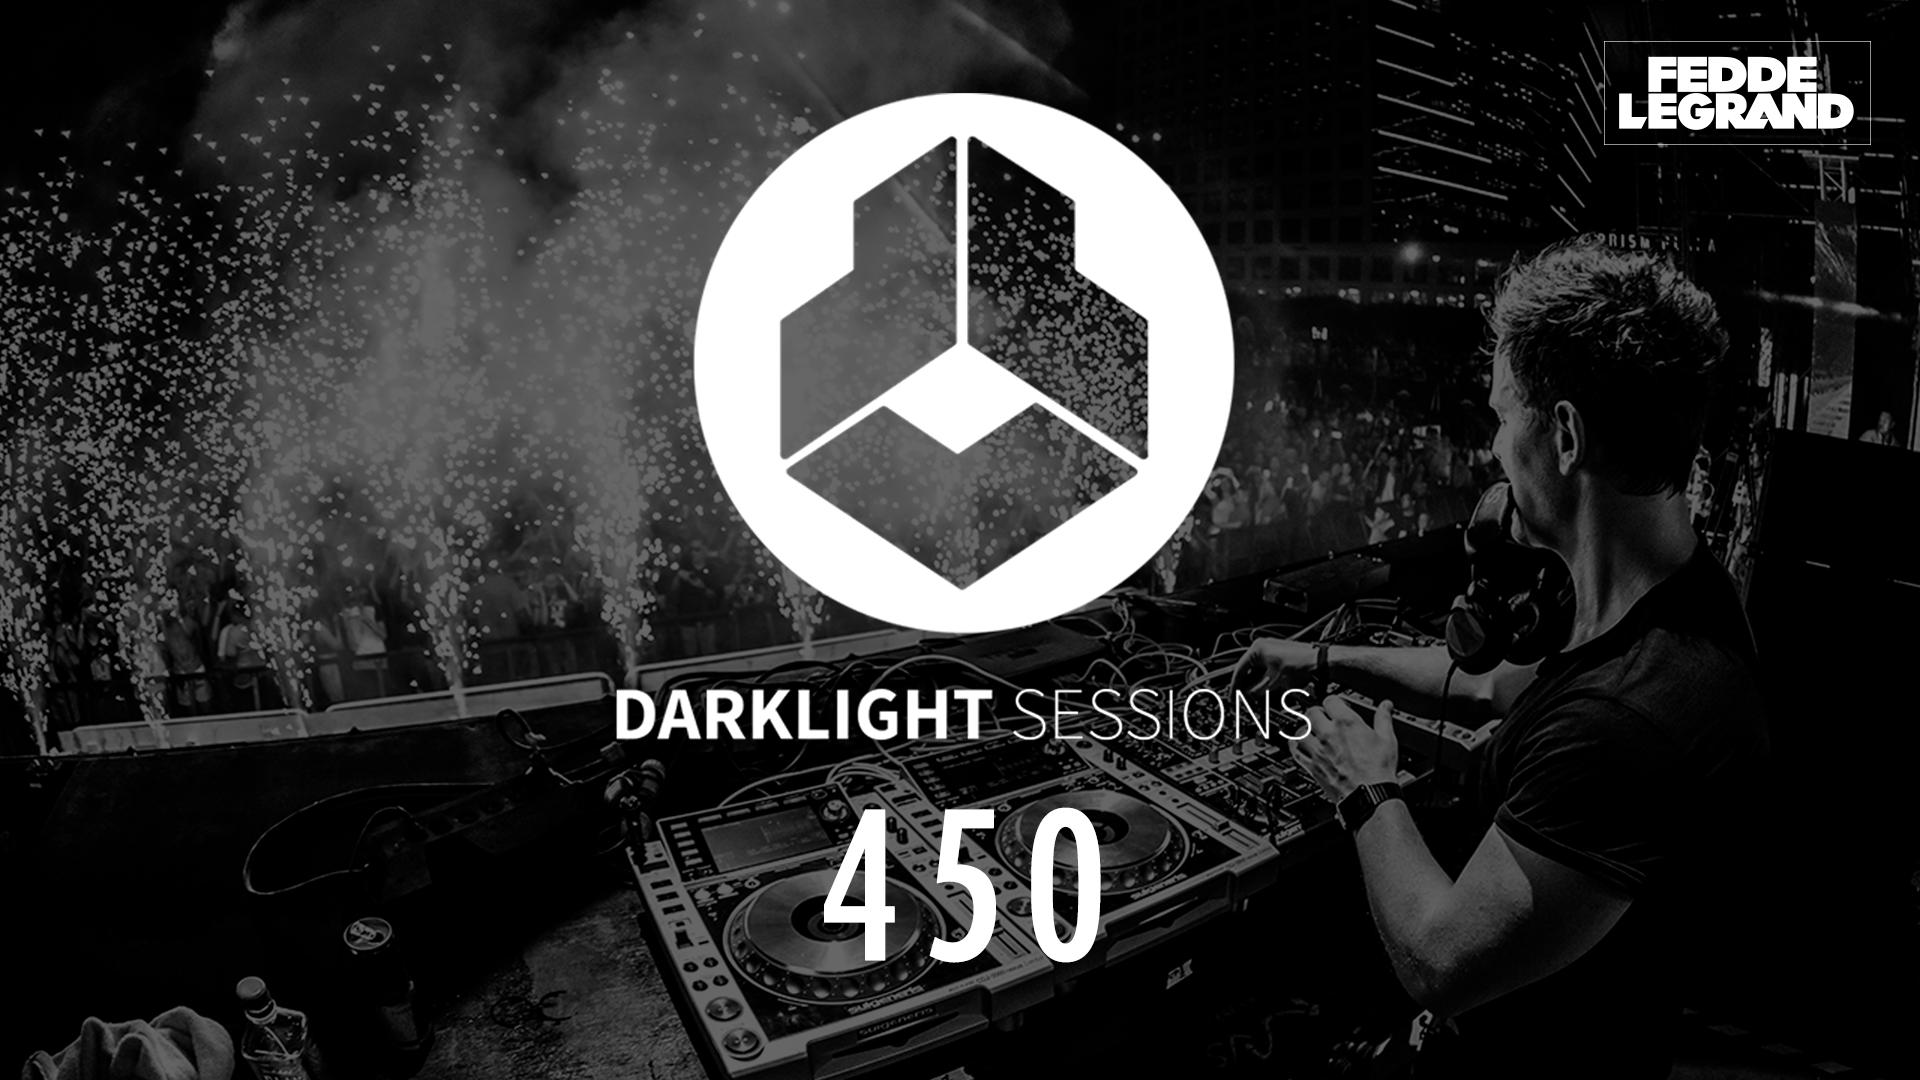 Darklight Sessions 450